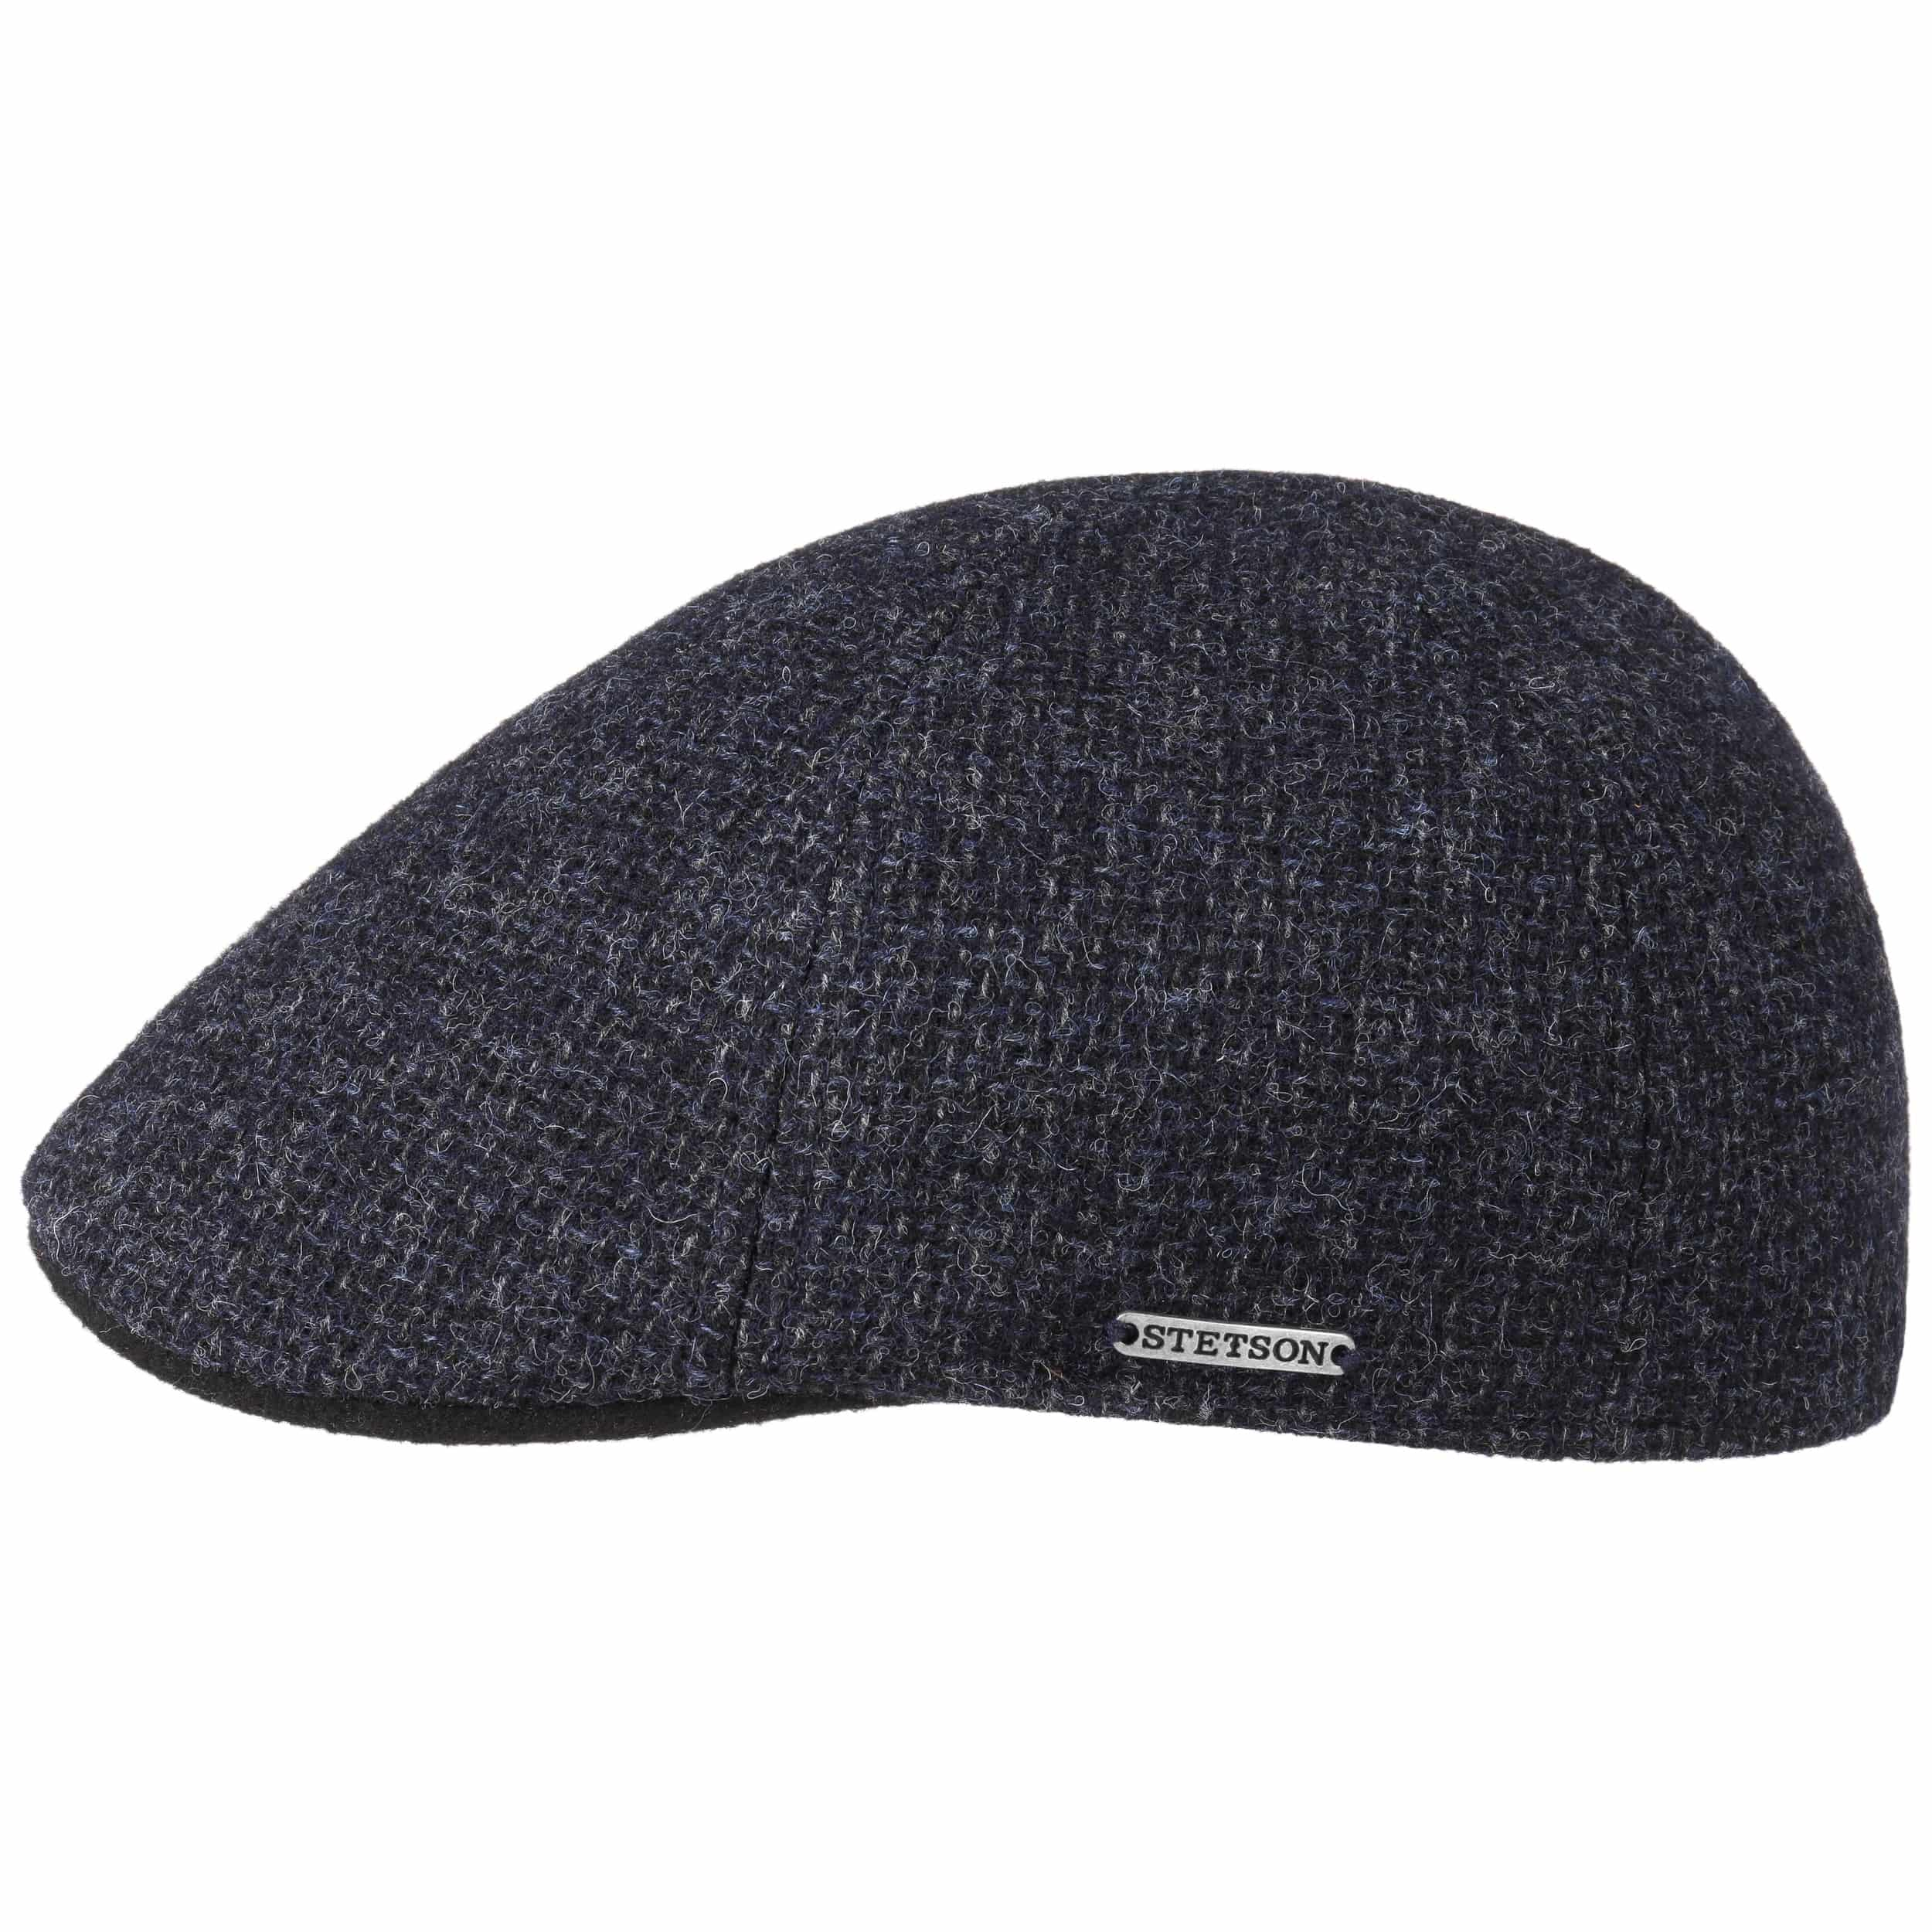 f022fb96a53e7 ... Texas Classic Wool Flat Cap by Stetson - dark grey 6 ...